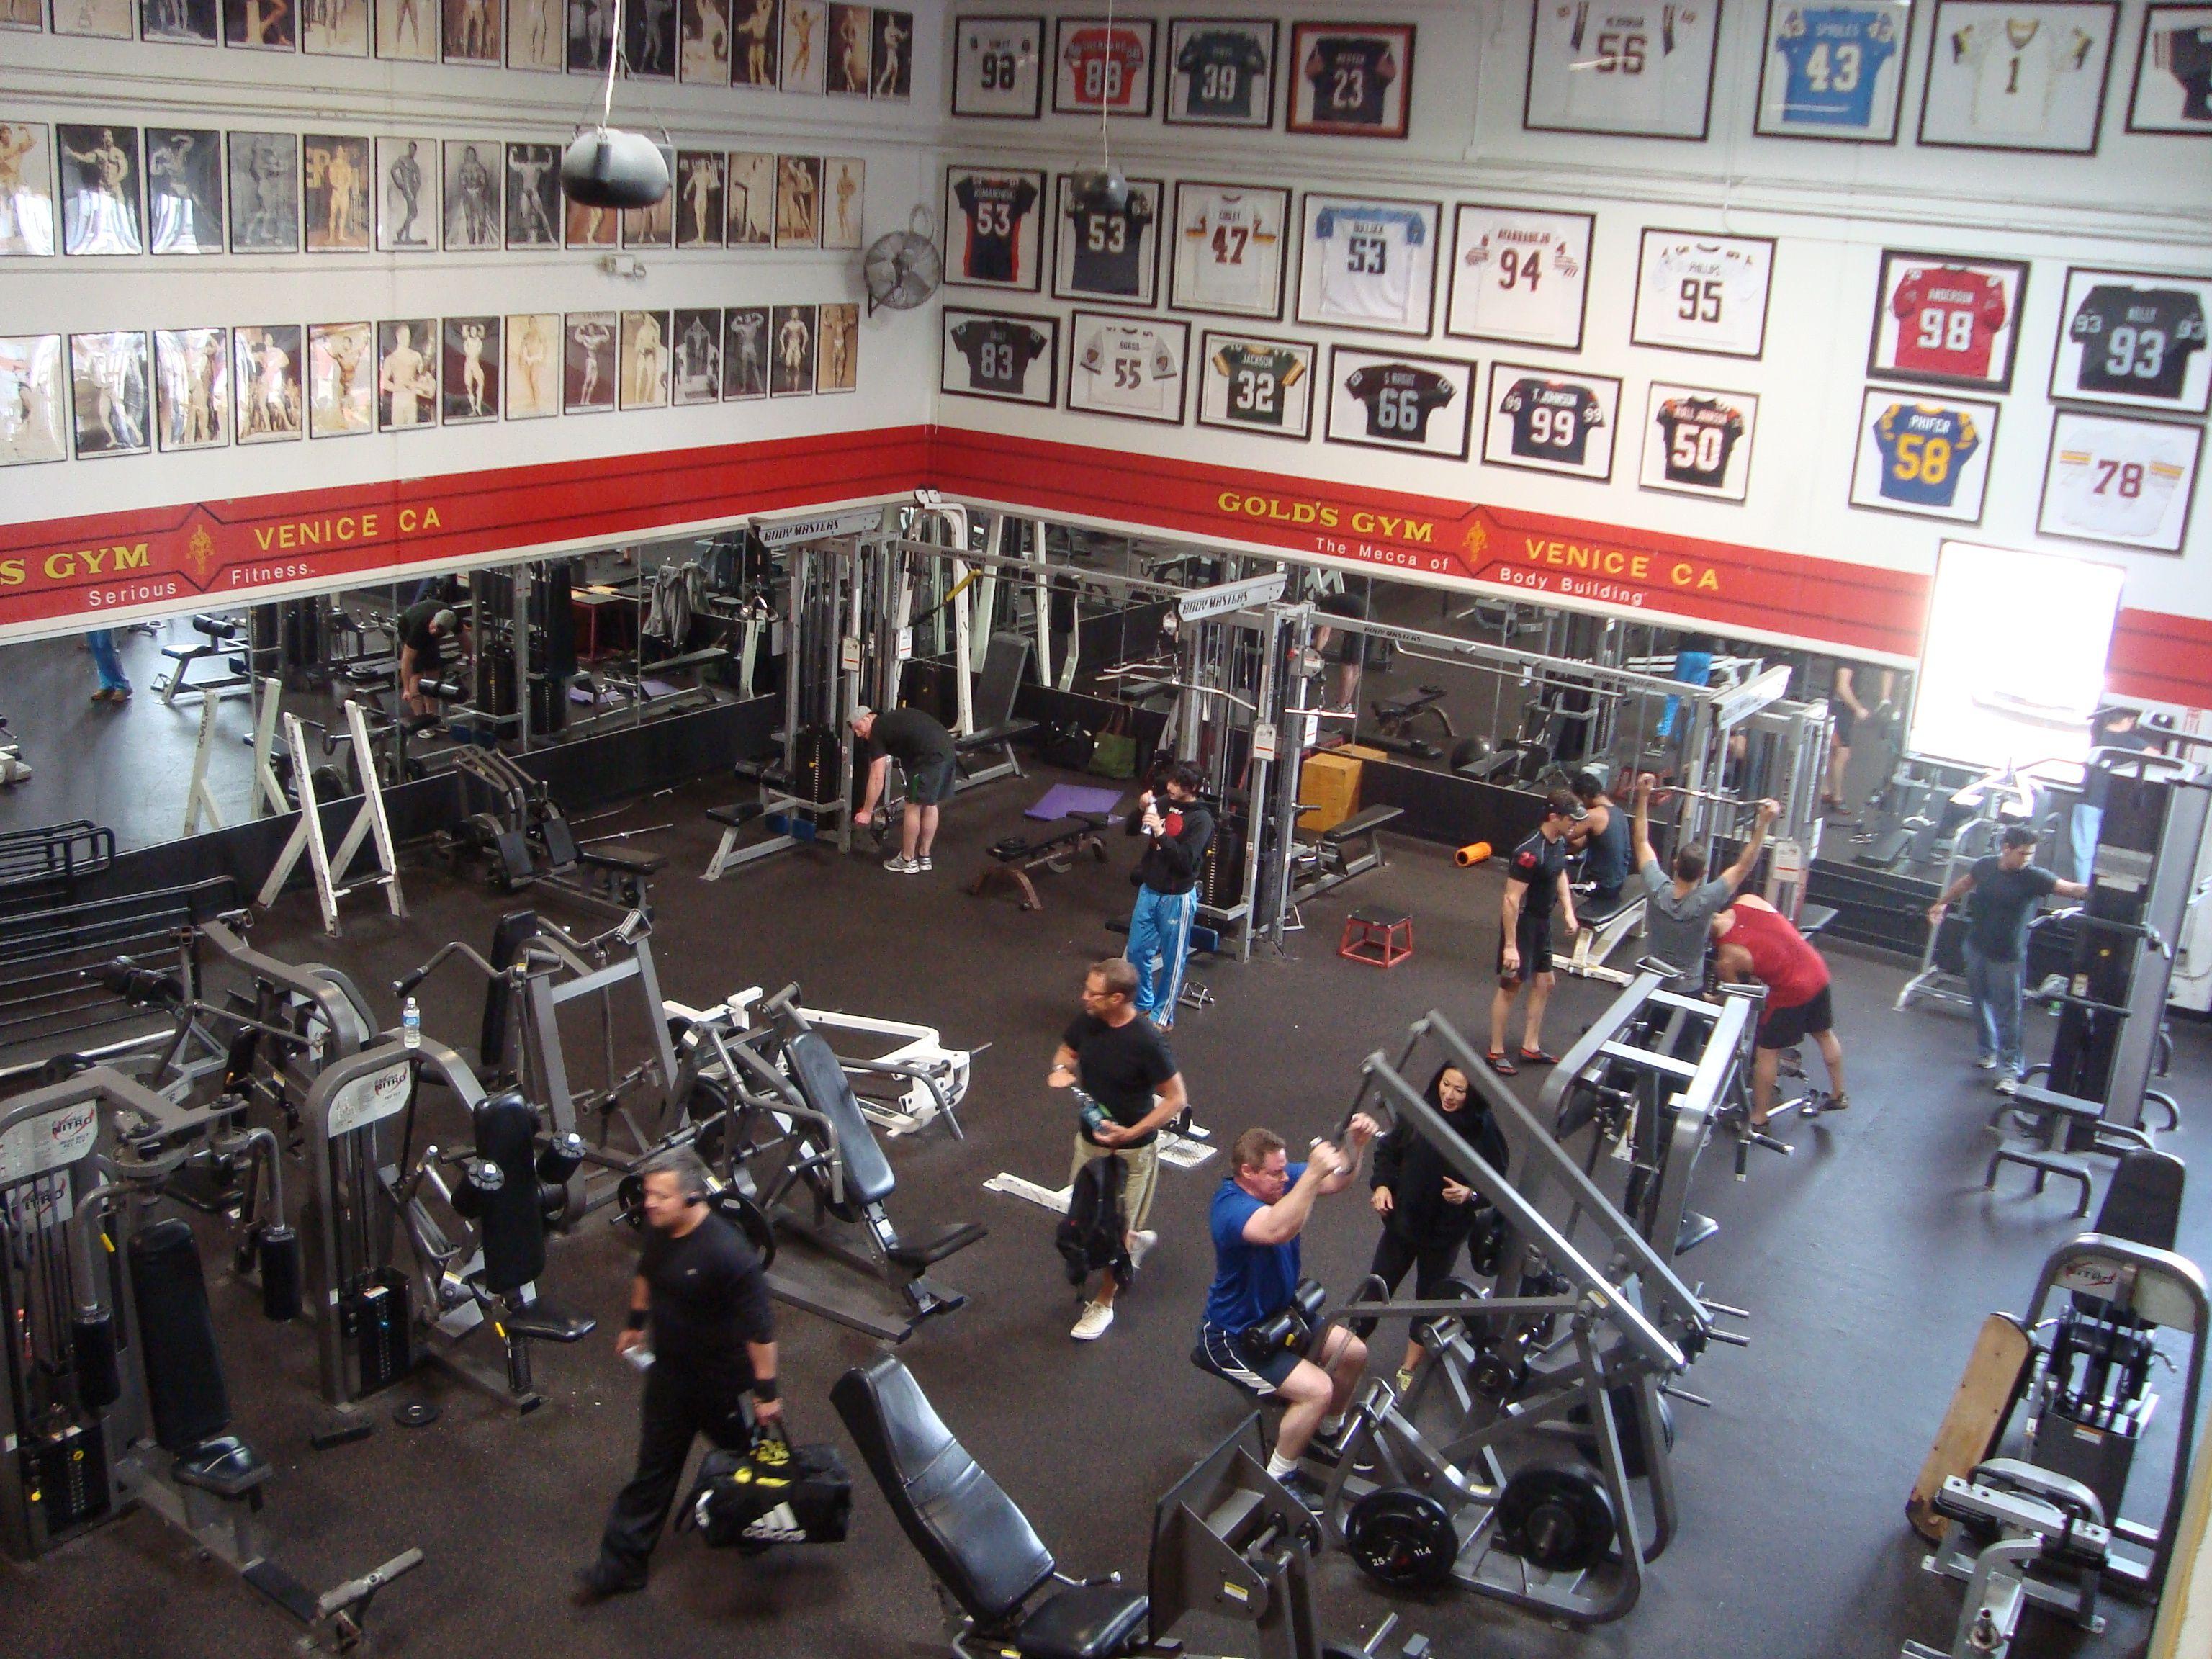 Gold's Gym – Venice, CA: The Mecca of Bodybuilding | los ...